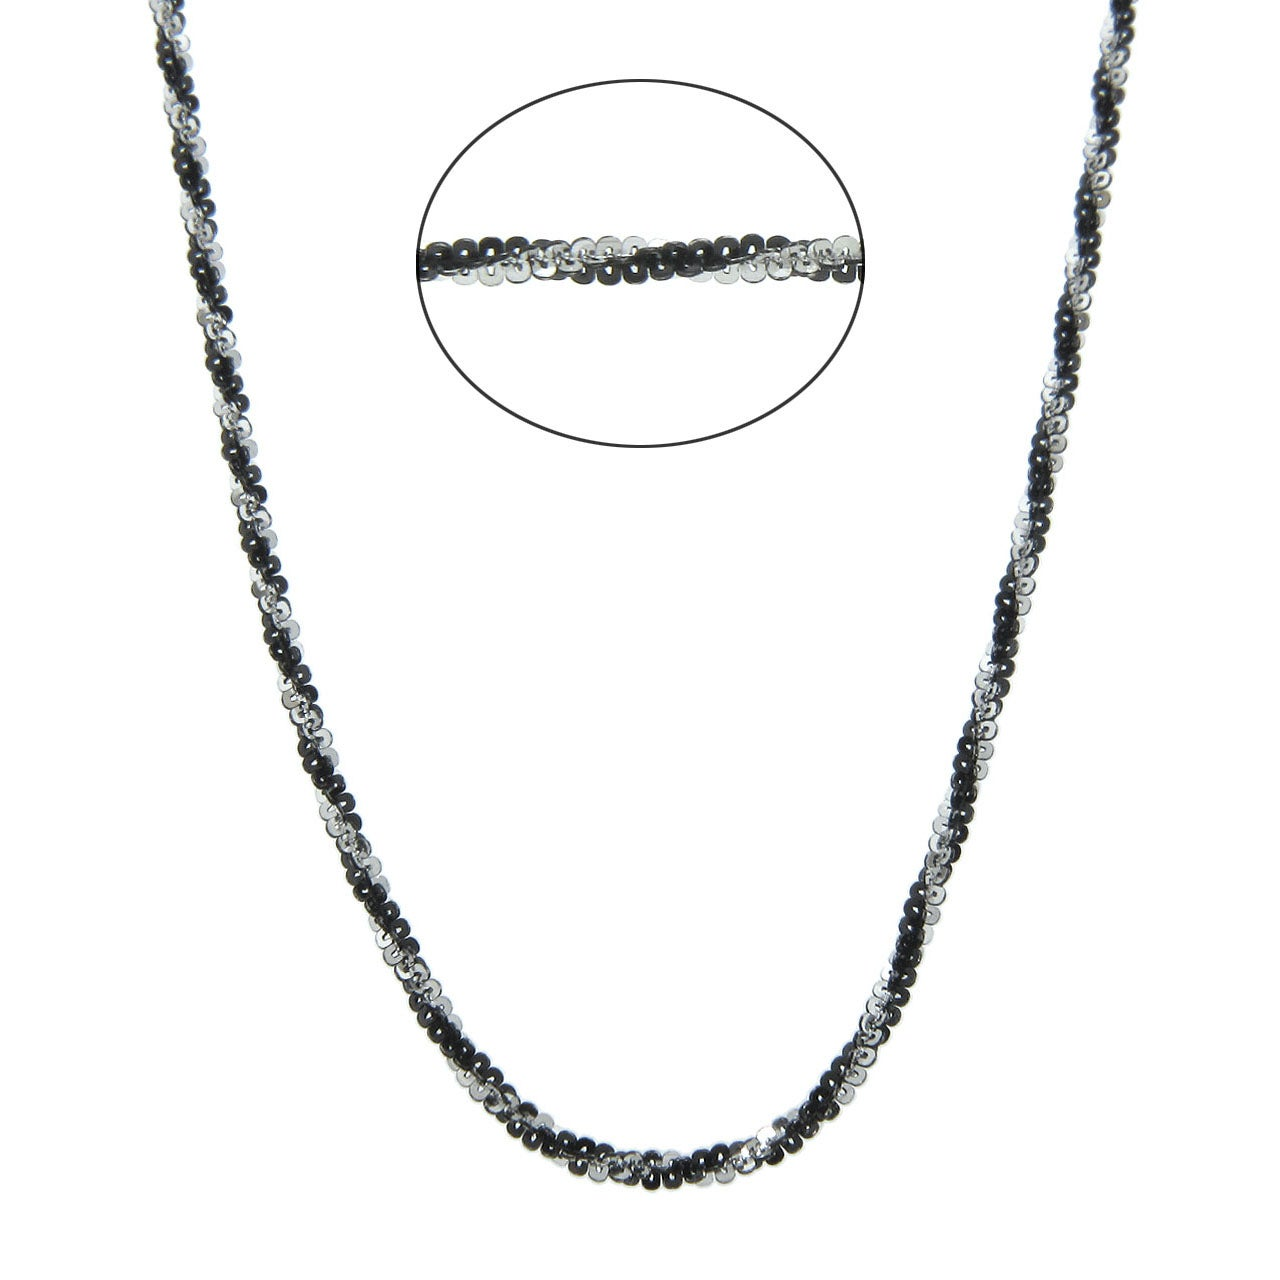 Eternally Haute Italian Black Rhodium-over-Silver Diamond-Cut Roc Chain with Lobster Claw Clasp